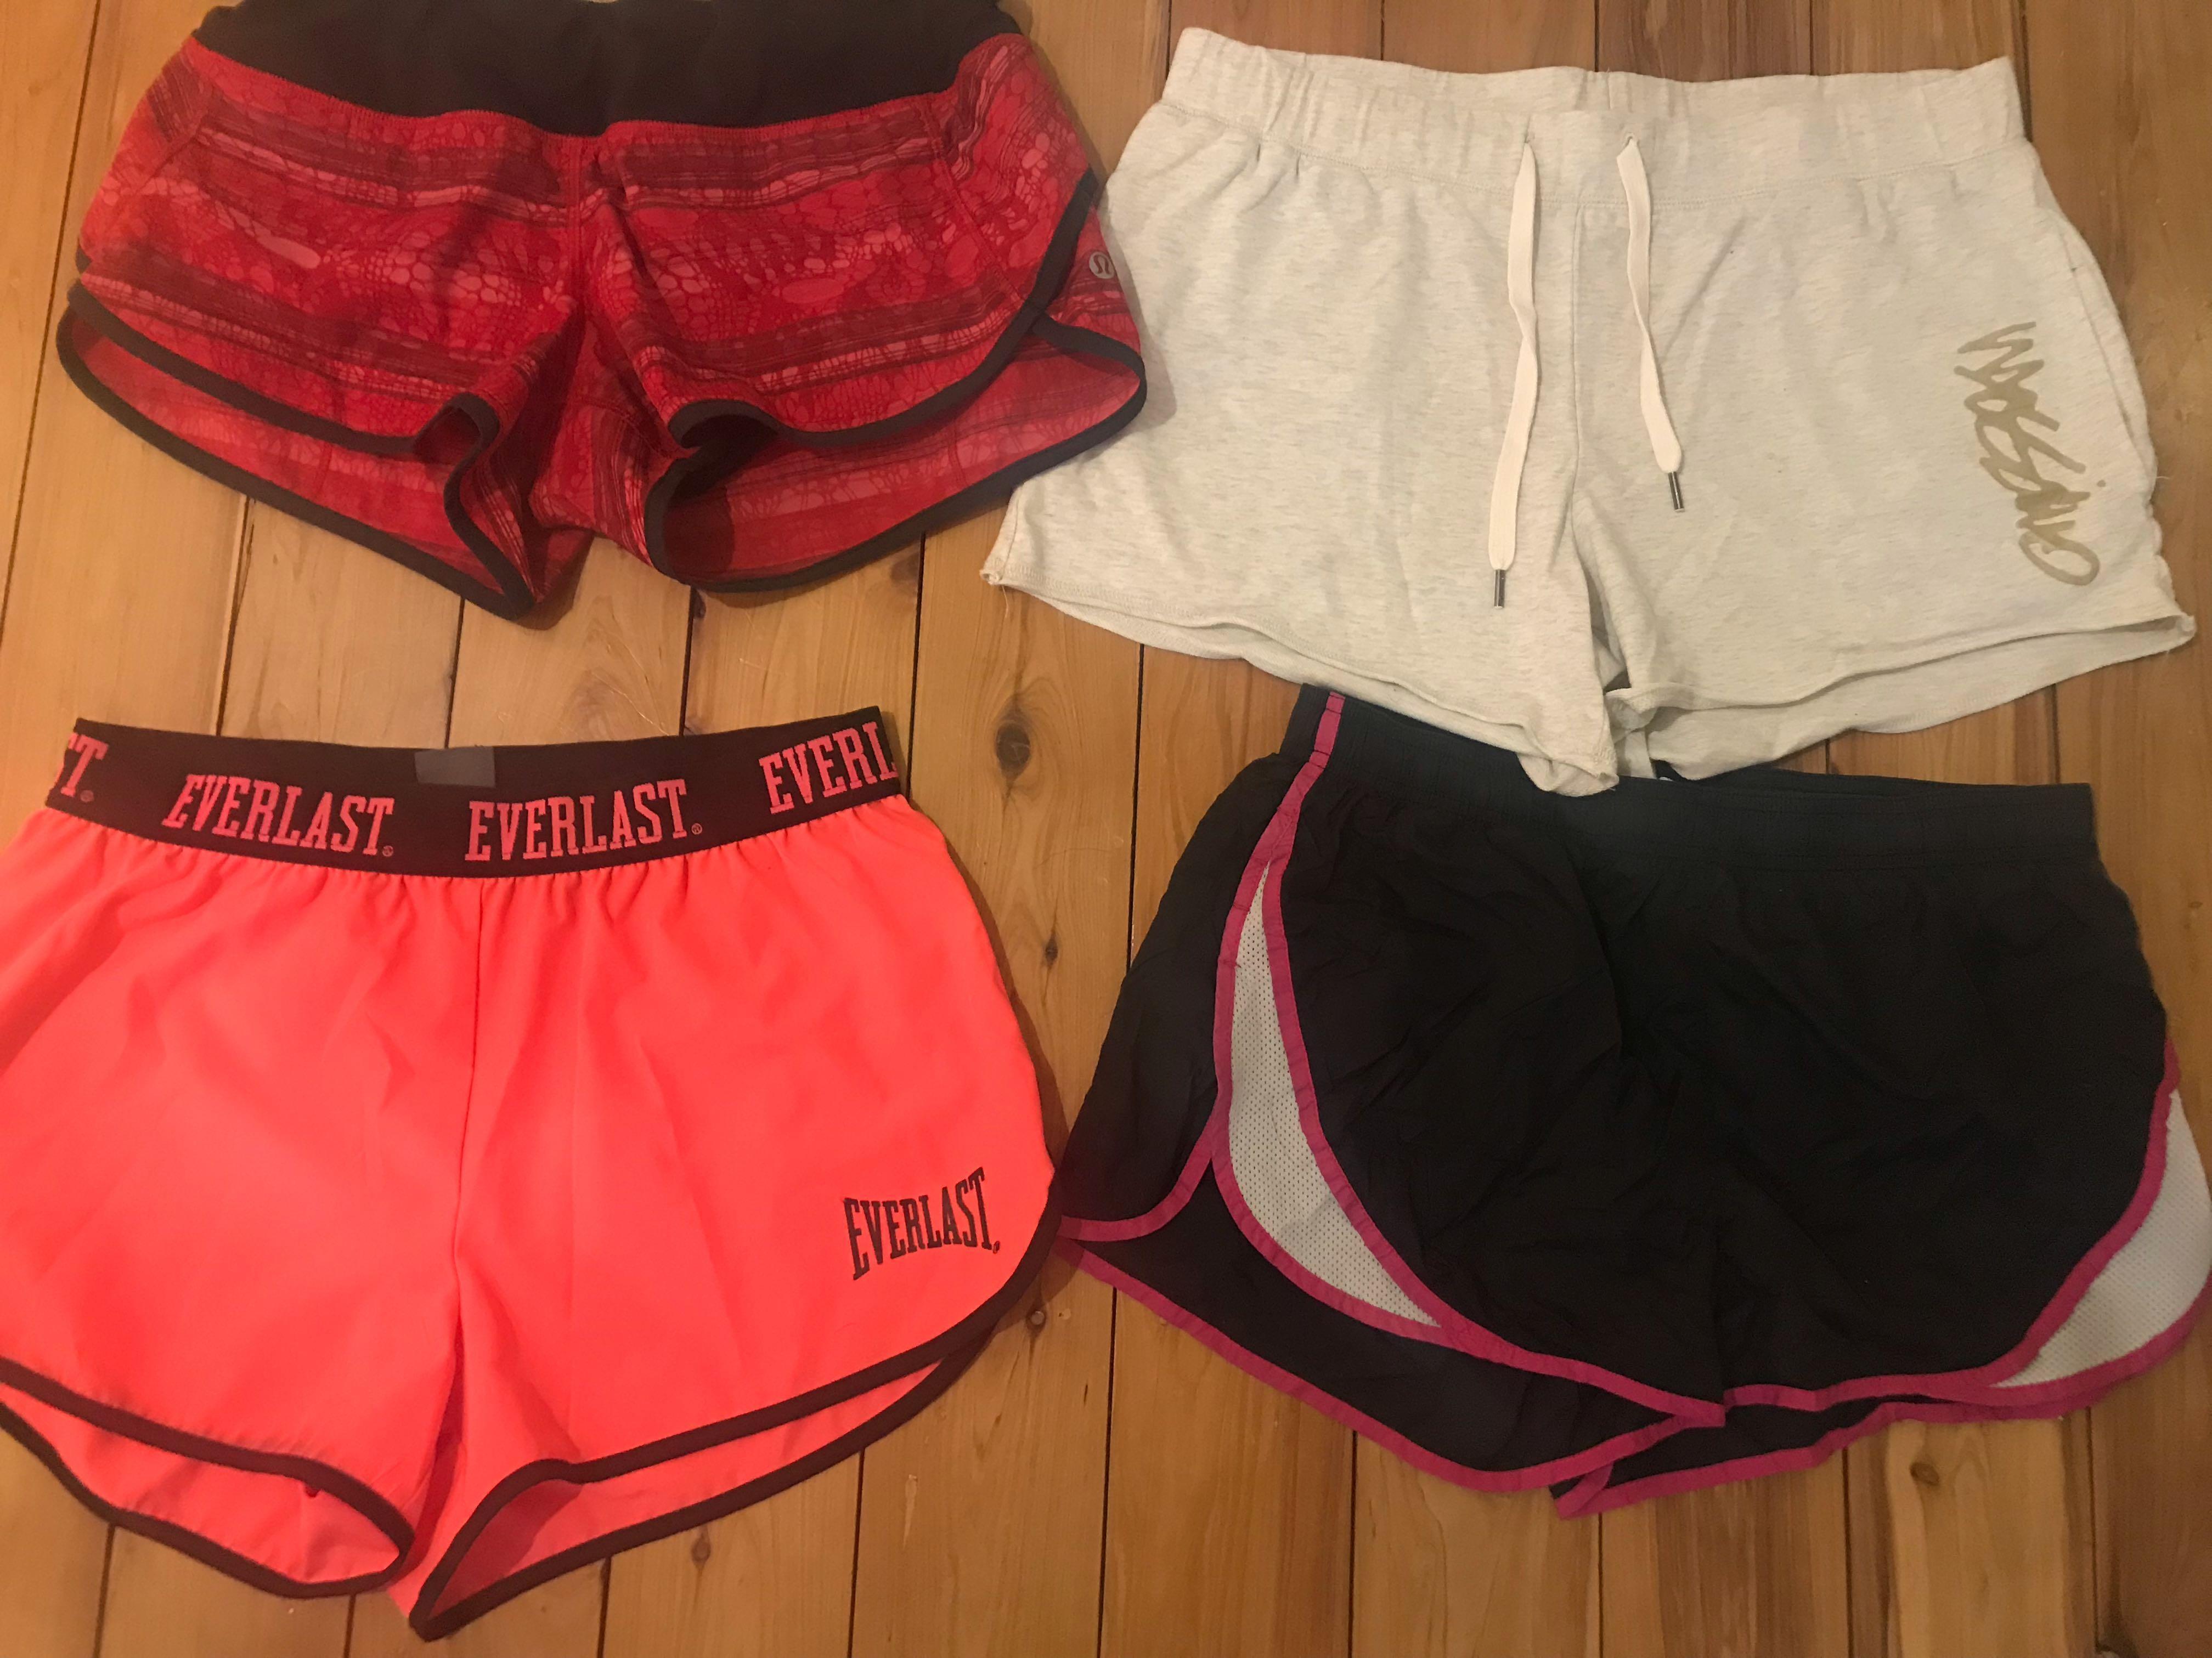 Bulk workout Lululemon, adidas, Lorna Jane, puma, ASICS, Everlast,